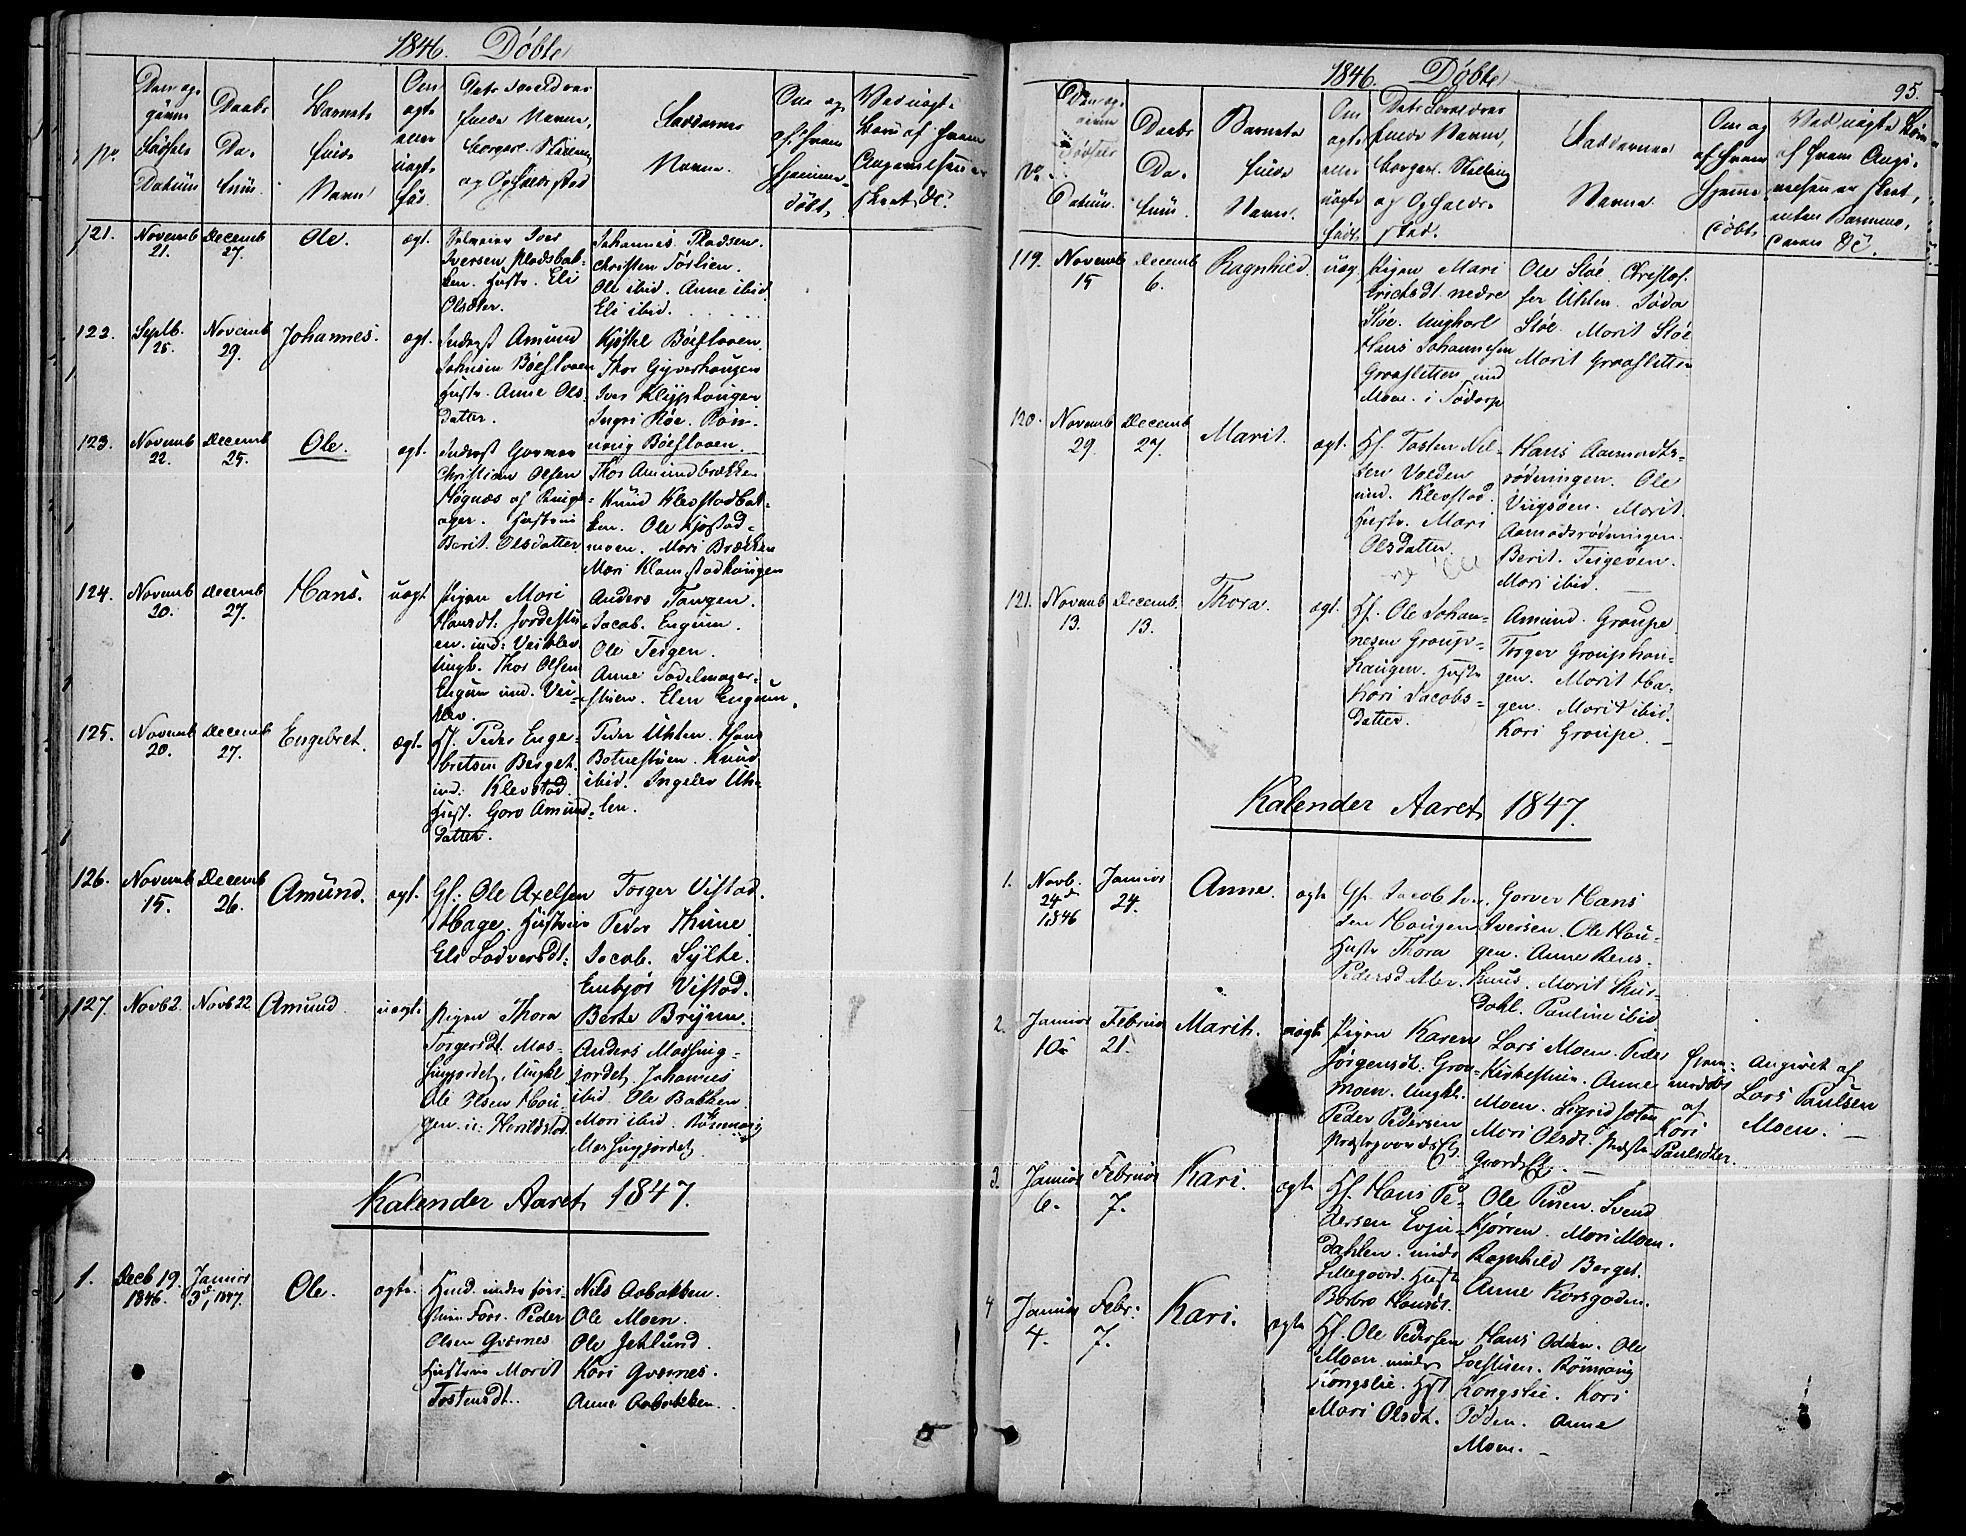 SAH, Fron prestekontor, H/Ha/Haa/L0004: Ministerialbok nr. 4, 1839-1848, s. 95